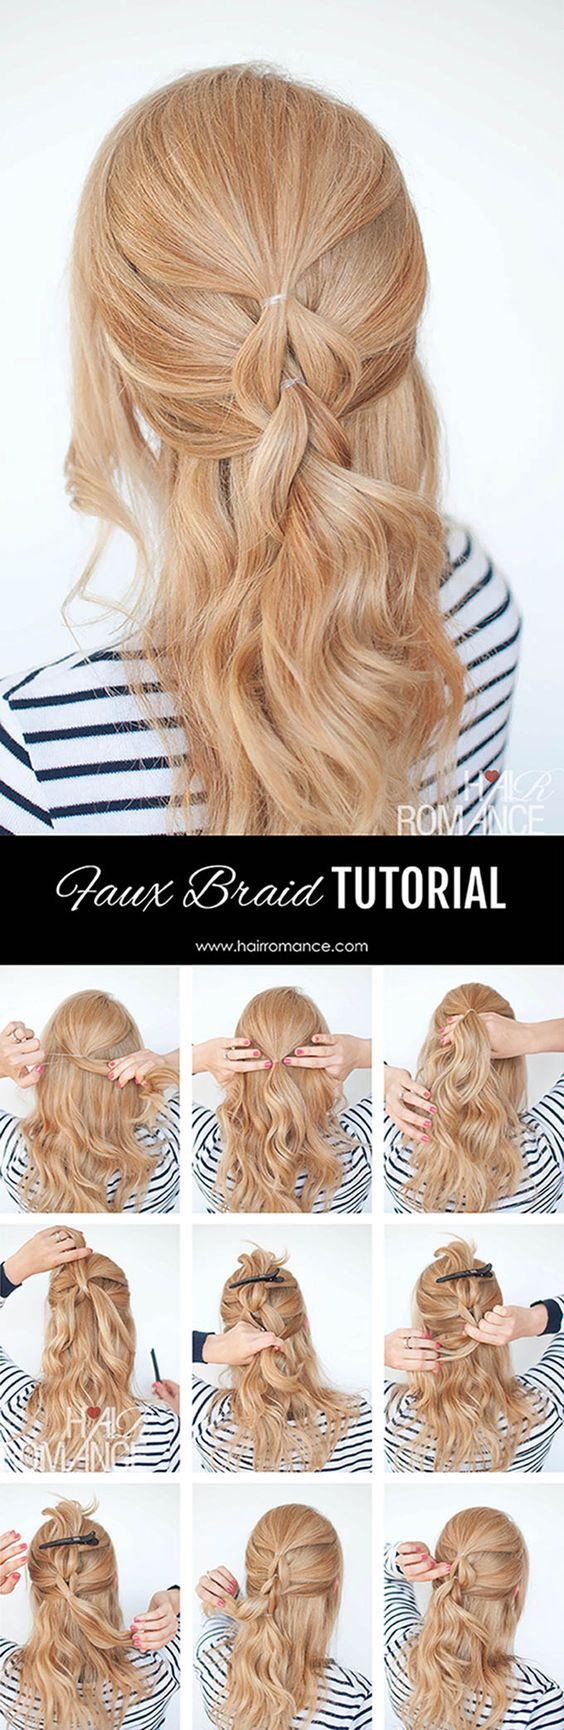 Best Hairstyles for Women: The no-braid braid – 5 pull-through braid tutorial...